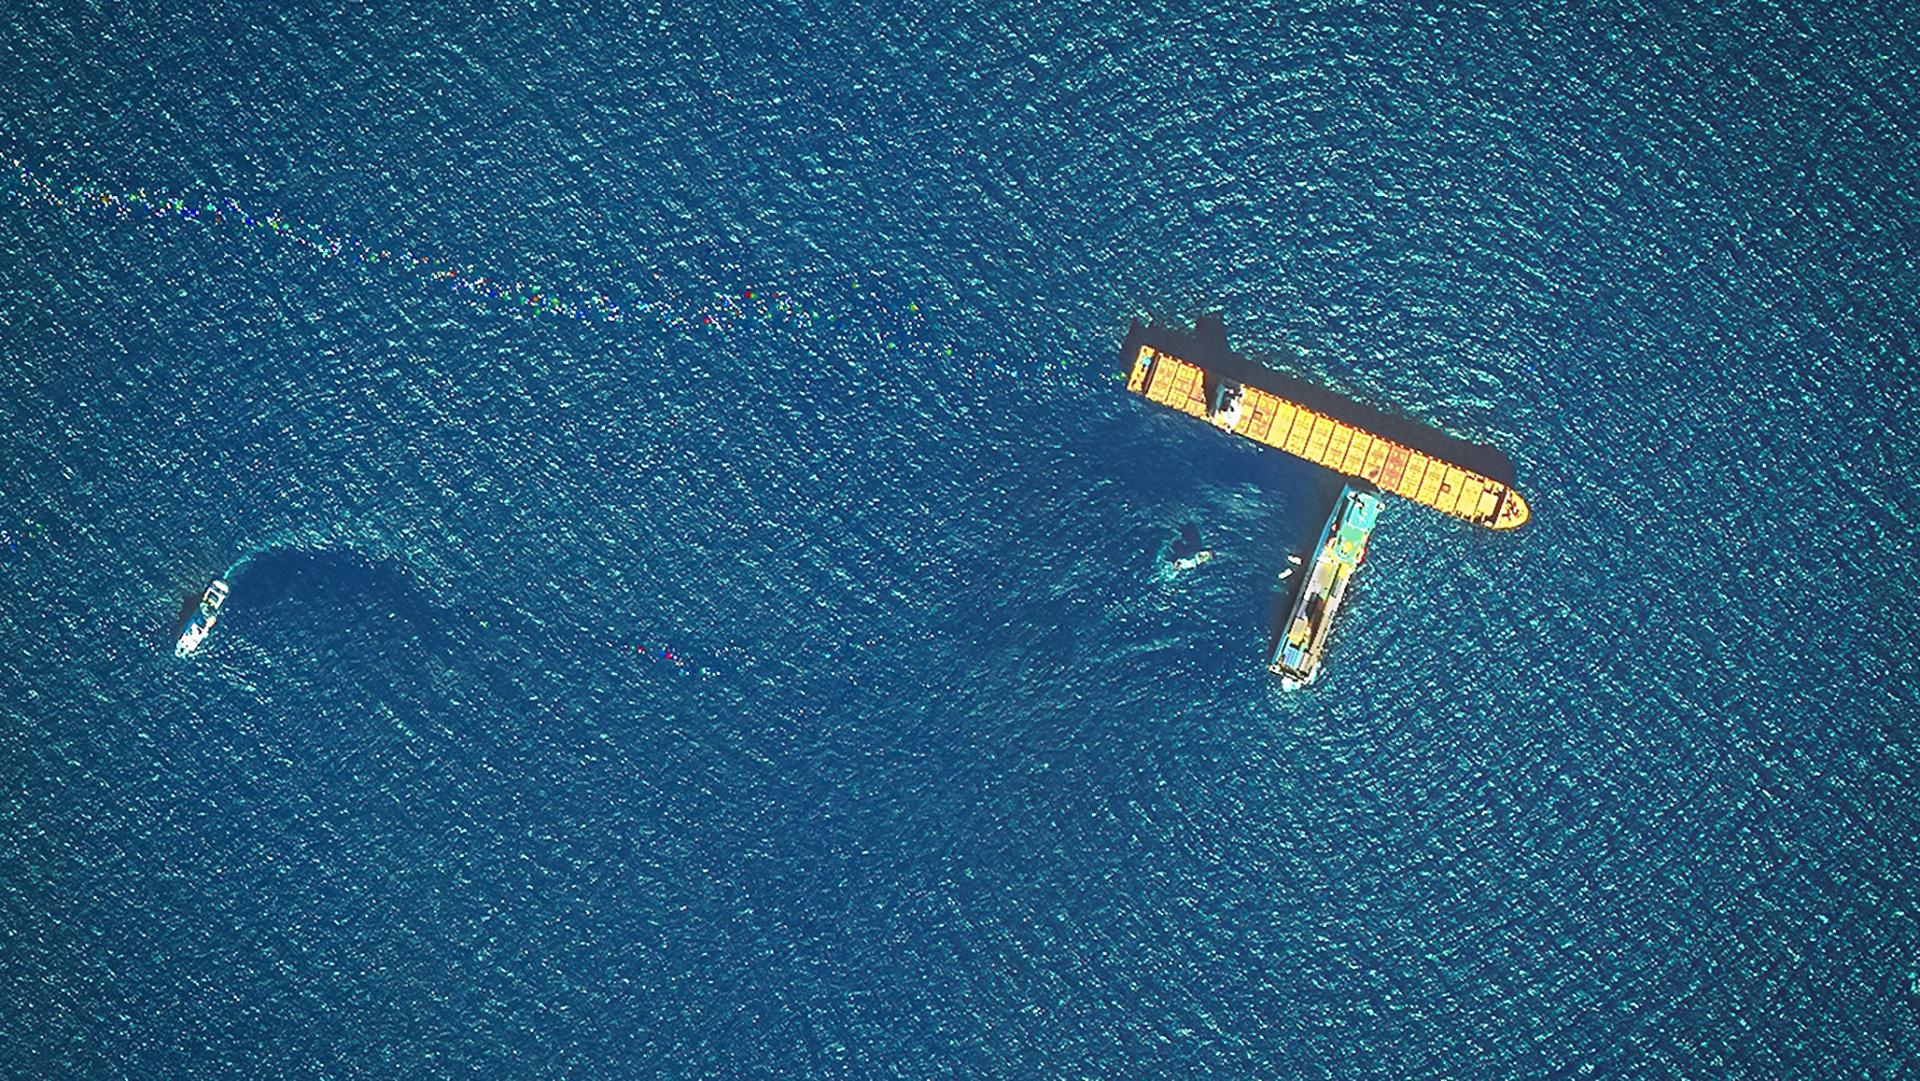 Major Oil Spill in the Mediterranean | European Space Imaging